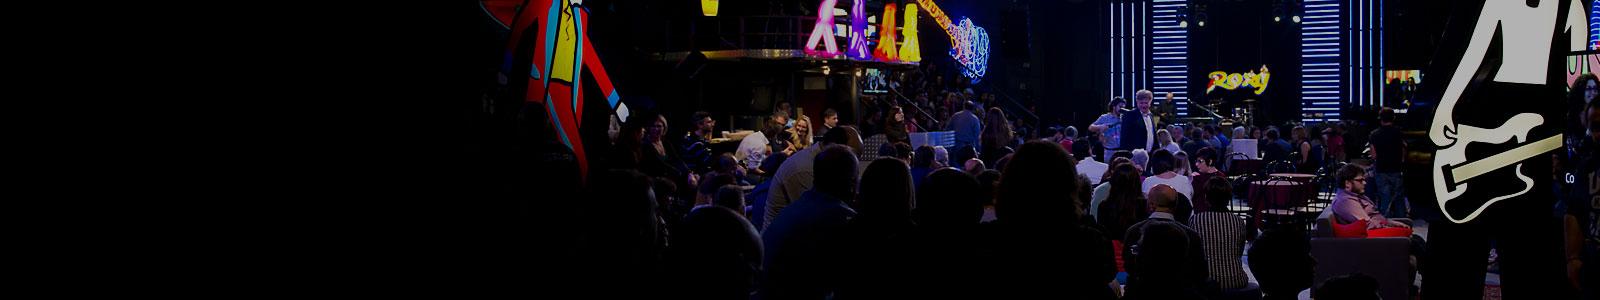 ROXY BAR | Enrico Ruggeri, Bengi Ridillo, Maurizio Ferrini, Erica Mou, Fausto Mesolella, Vittorio De Scalzi, Ermal Meta, Antonio Maggio, Gianni Fantoni